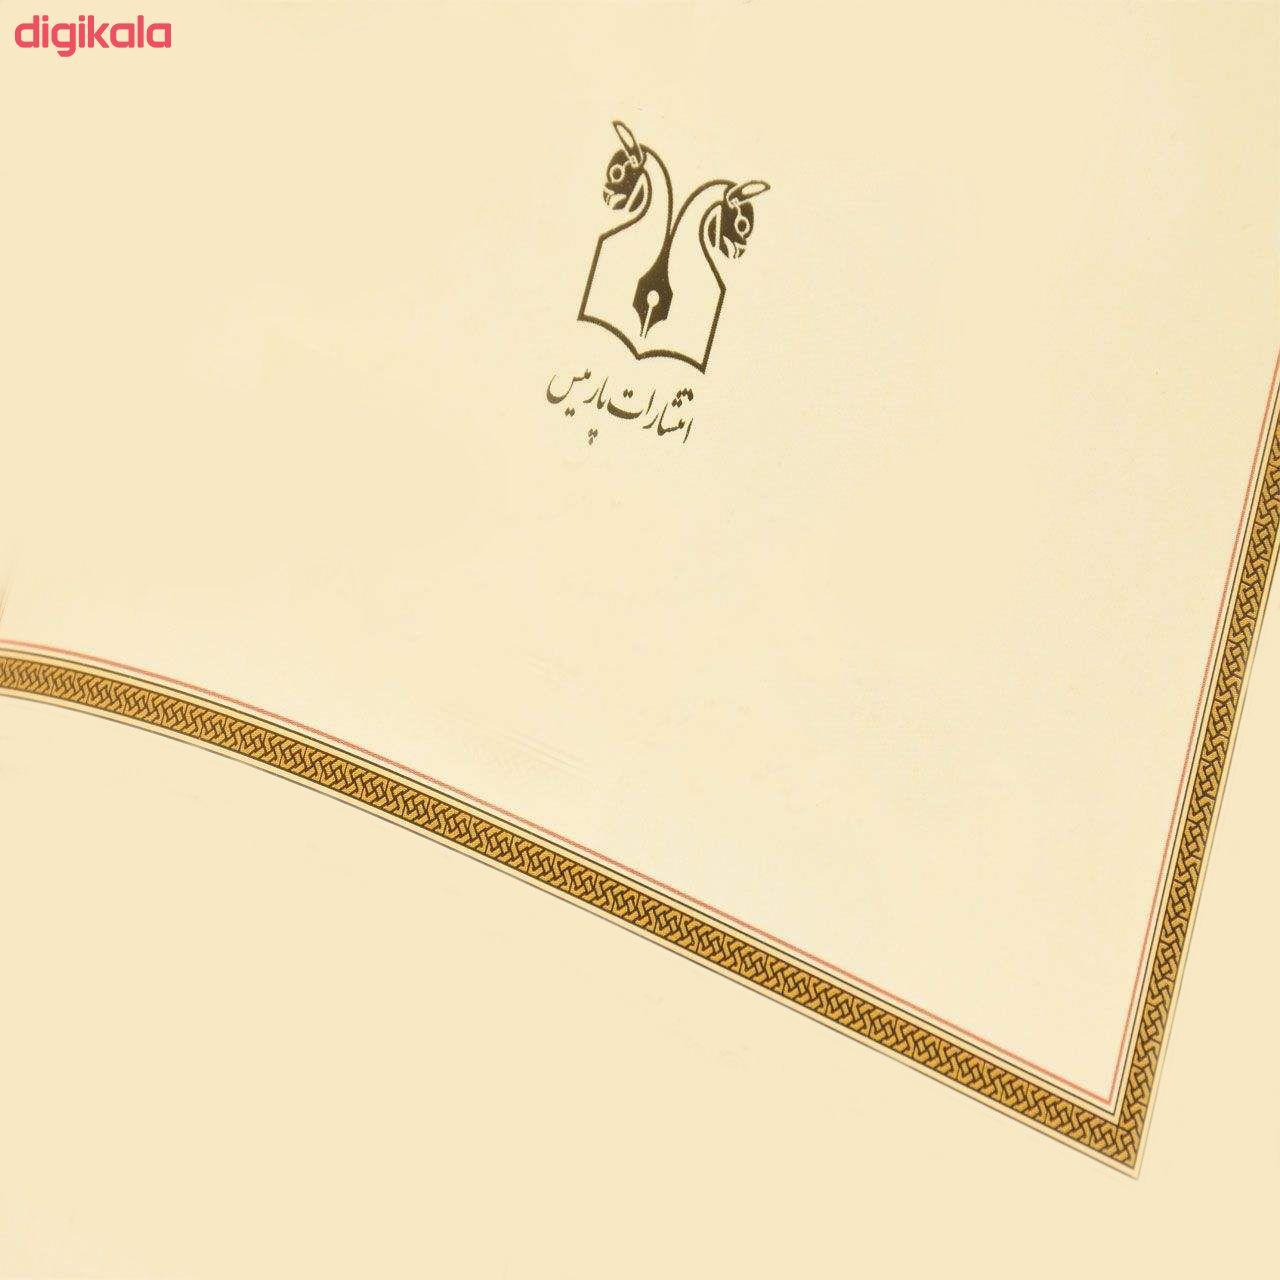 کتاب شکوه عشق اثر الیف شافاک انتشارات پارمیس main 1 3